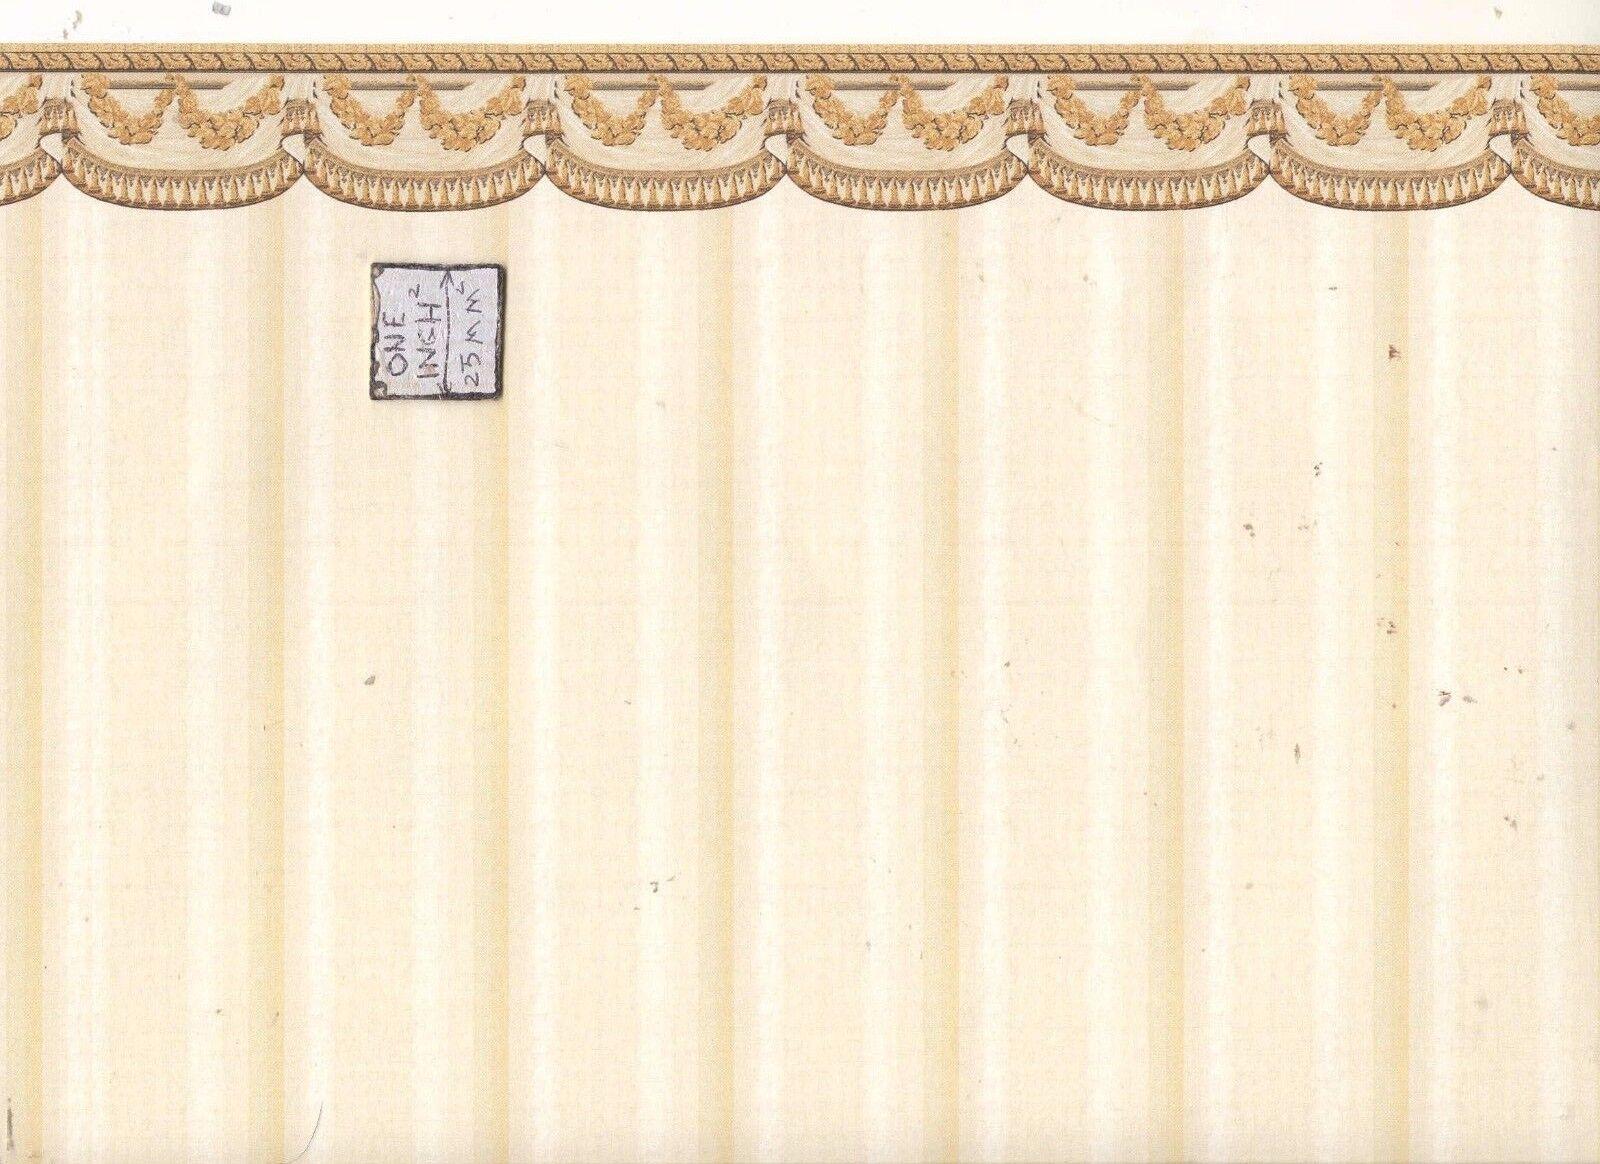 Wallpaper 1//12 scale dollhouse miniature 1pc WP935